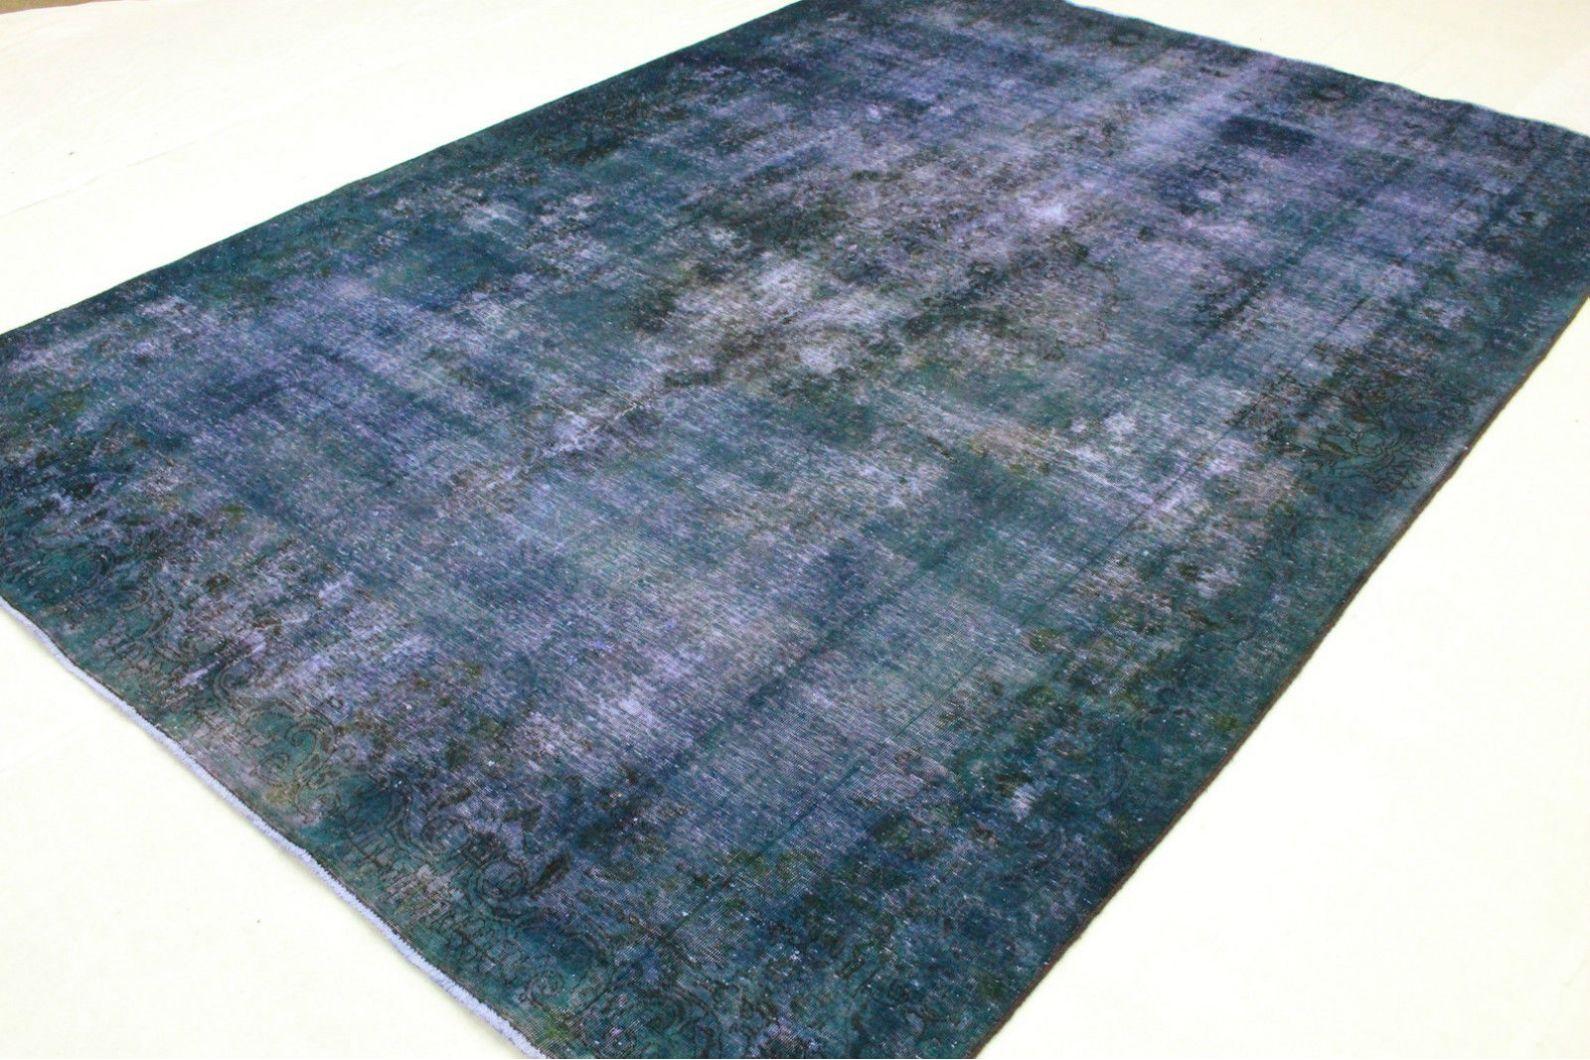 vintage teppich lila blau in 400x280cm 1001 3295 bei kaufen. Black Bedroom Furniture Sets. Home Design Ideas